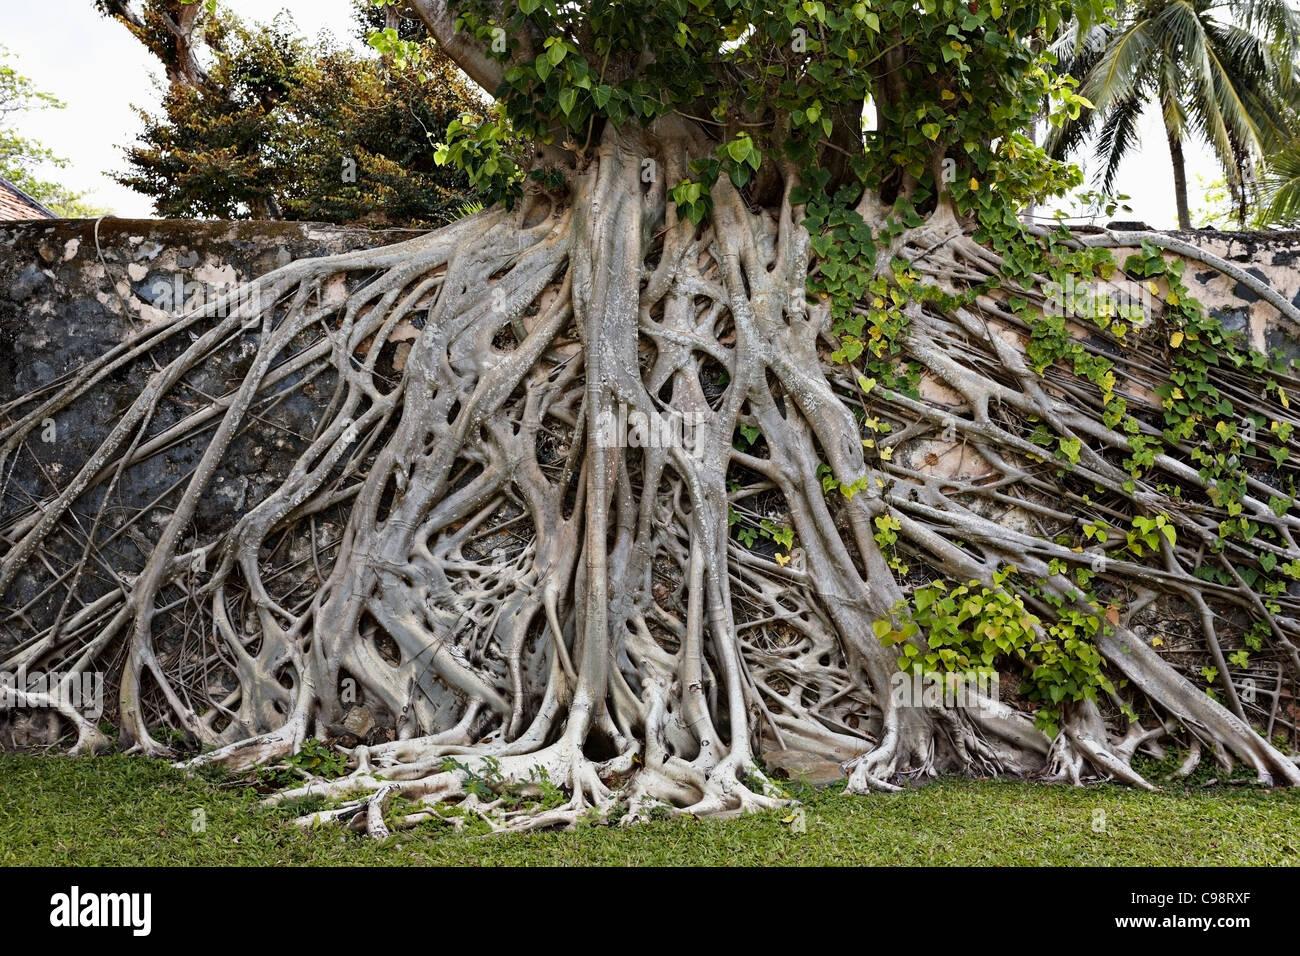 Strangler fig tree Con Dao Island, Vietnam Stock Photo